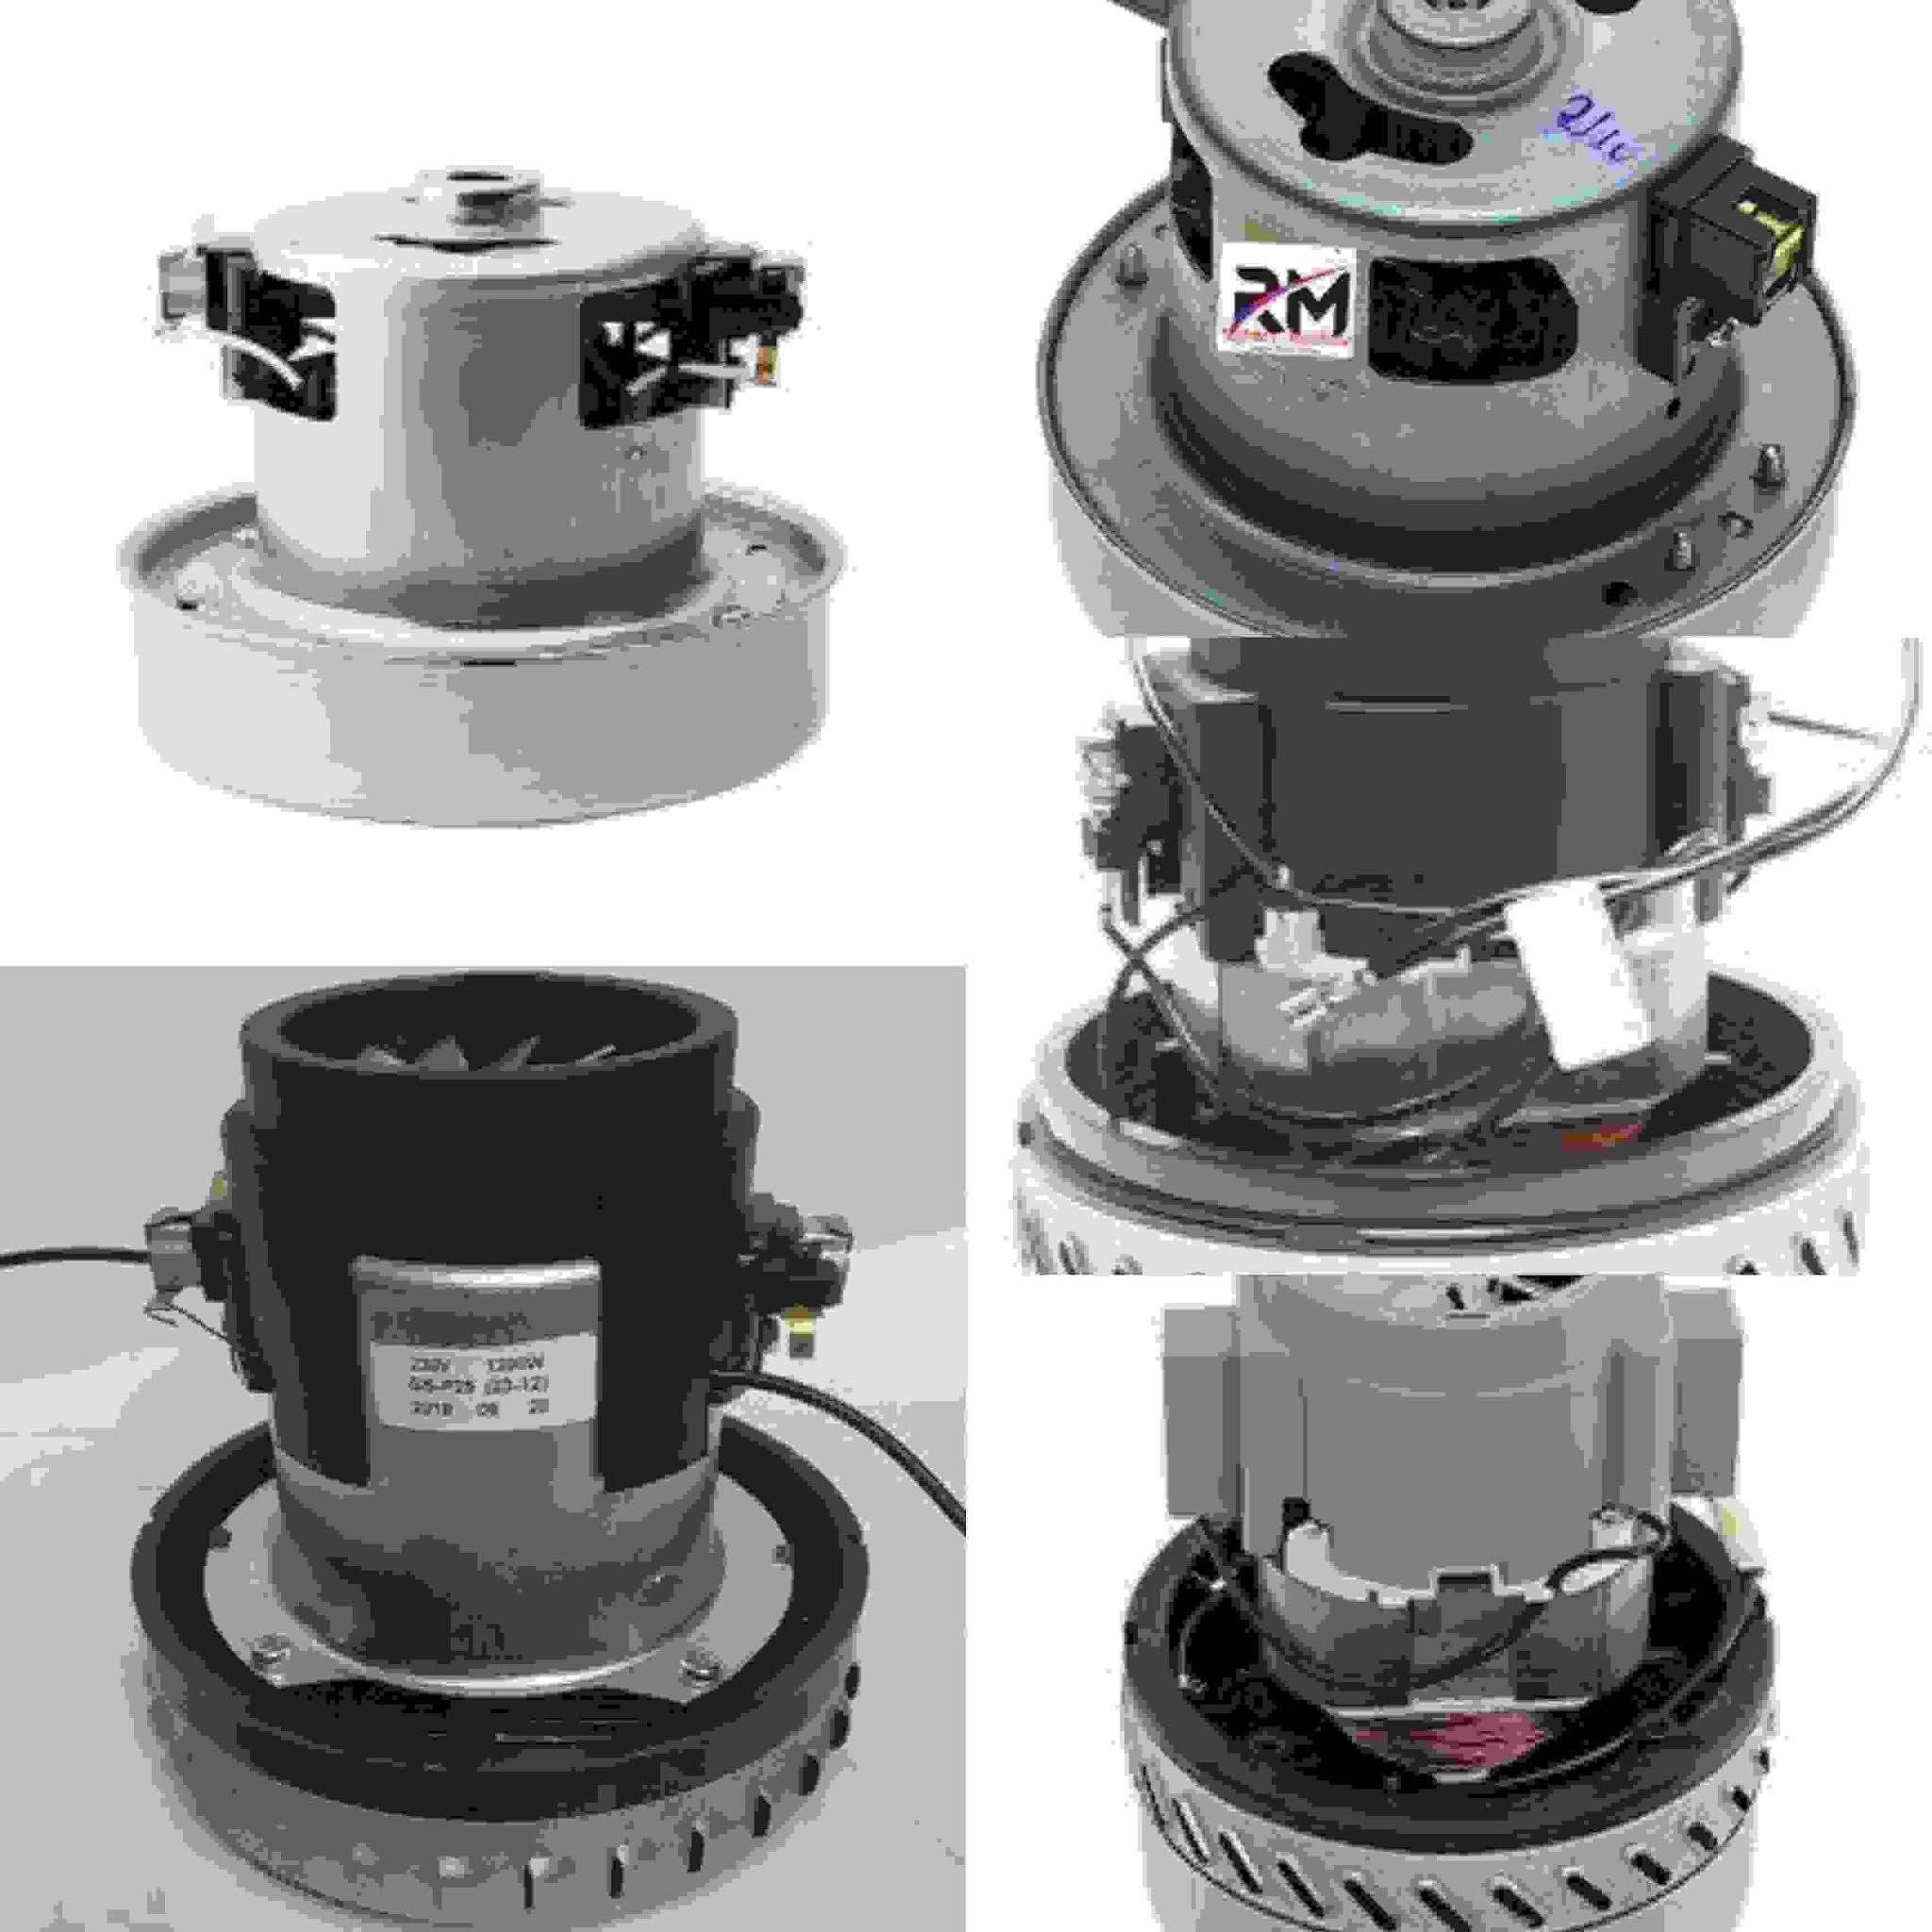 Vacuum Cleaner Repairing sales and service